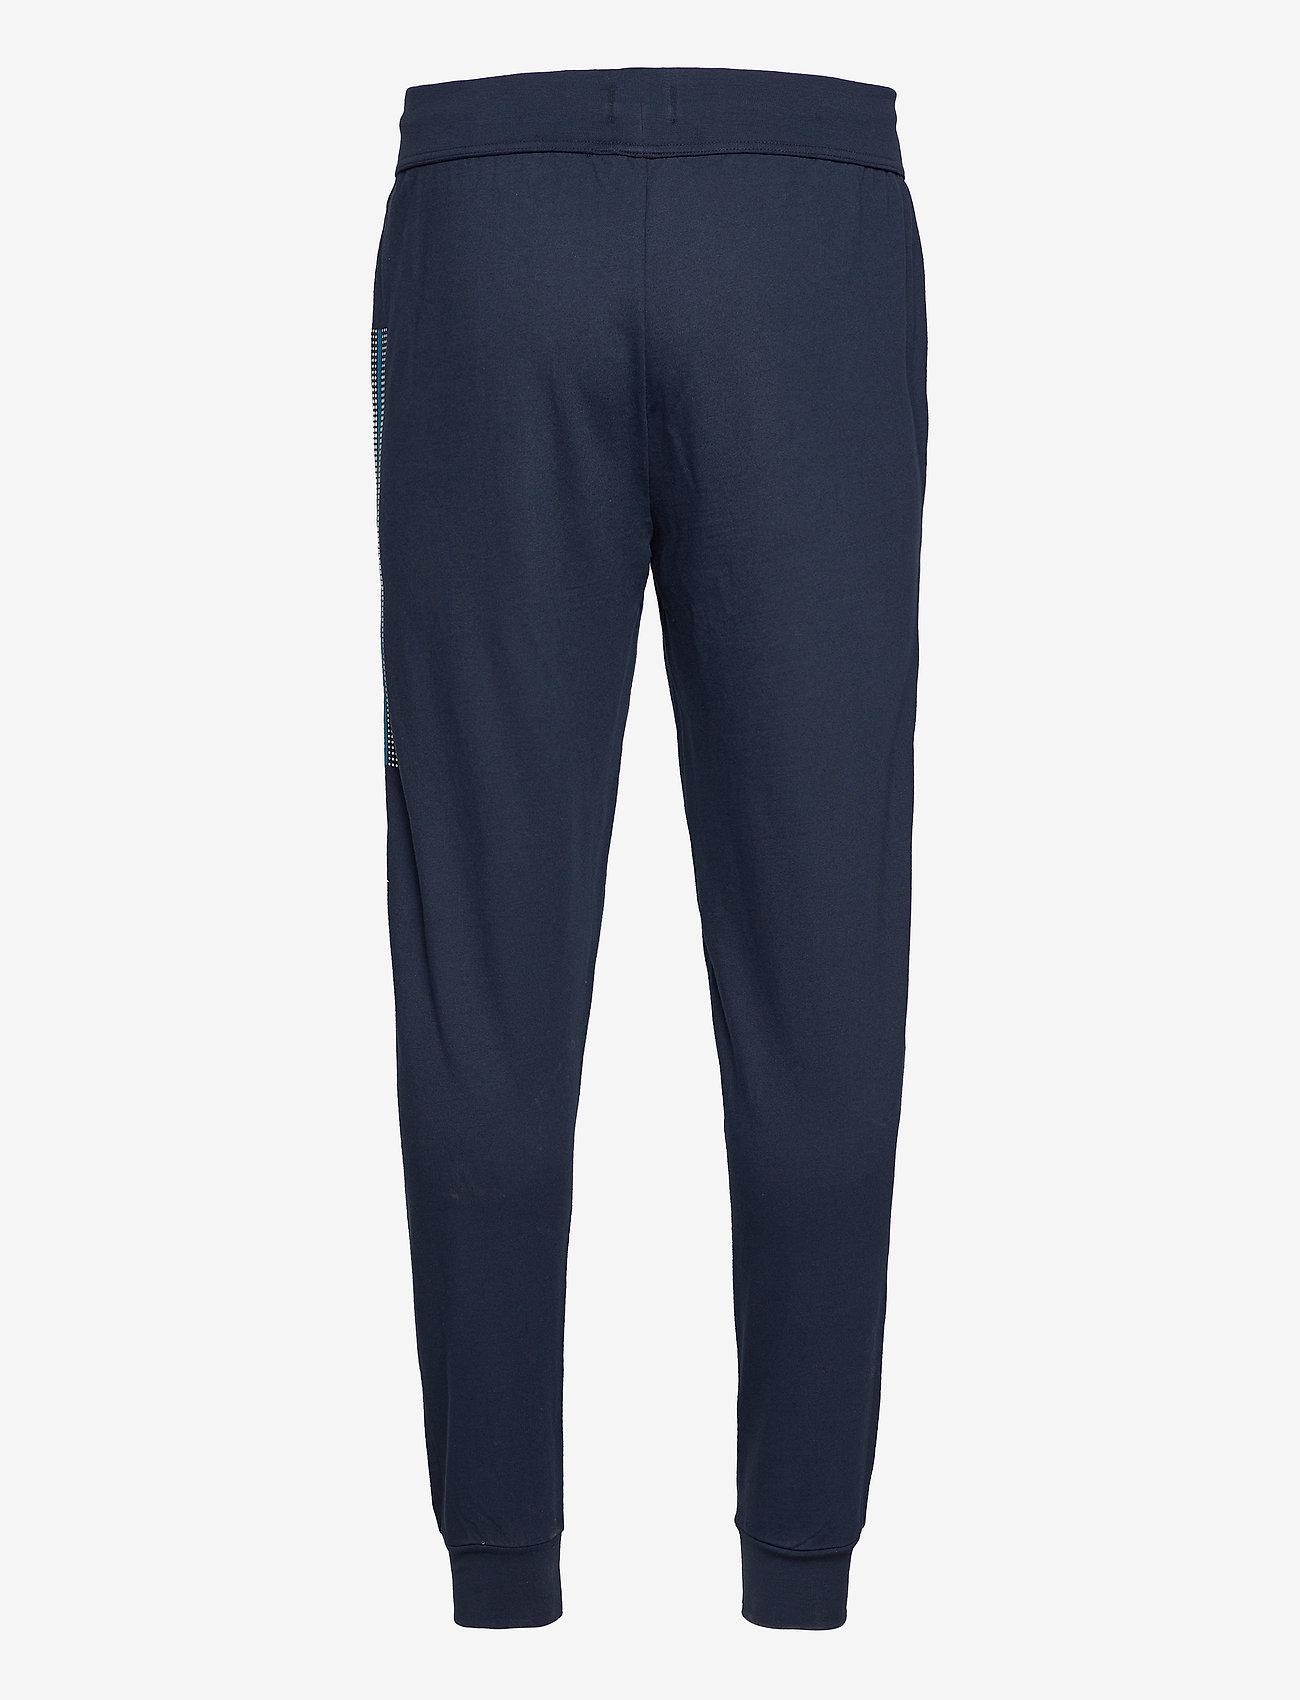 BOSS - Authentic Pants - bas de pyjama - dark blue - 1